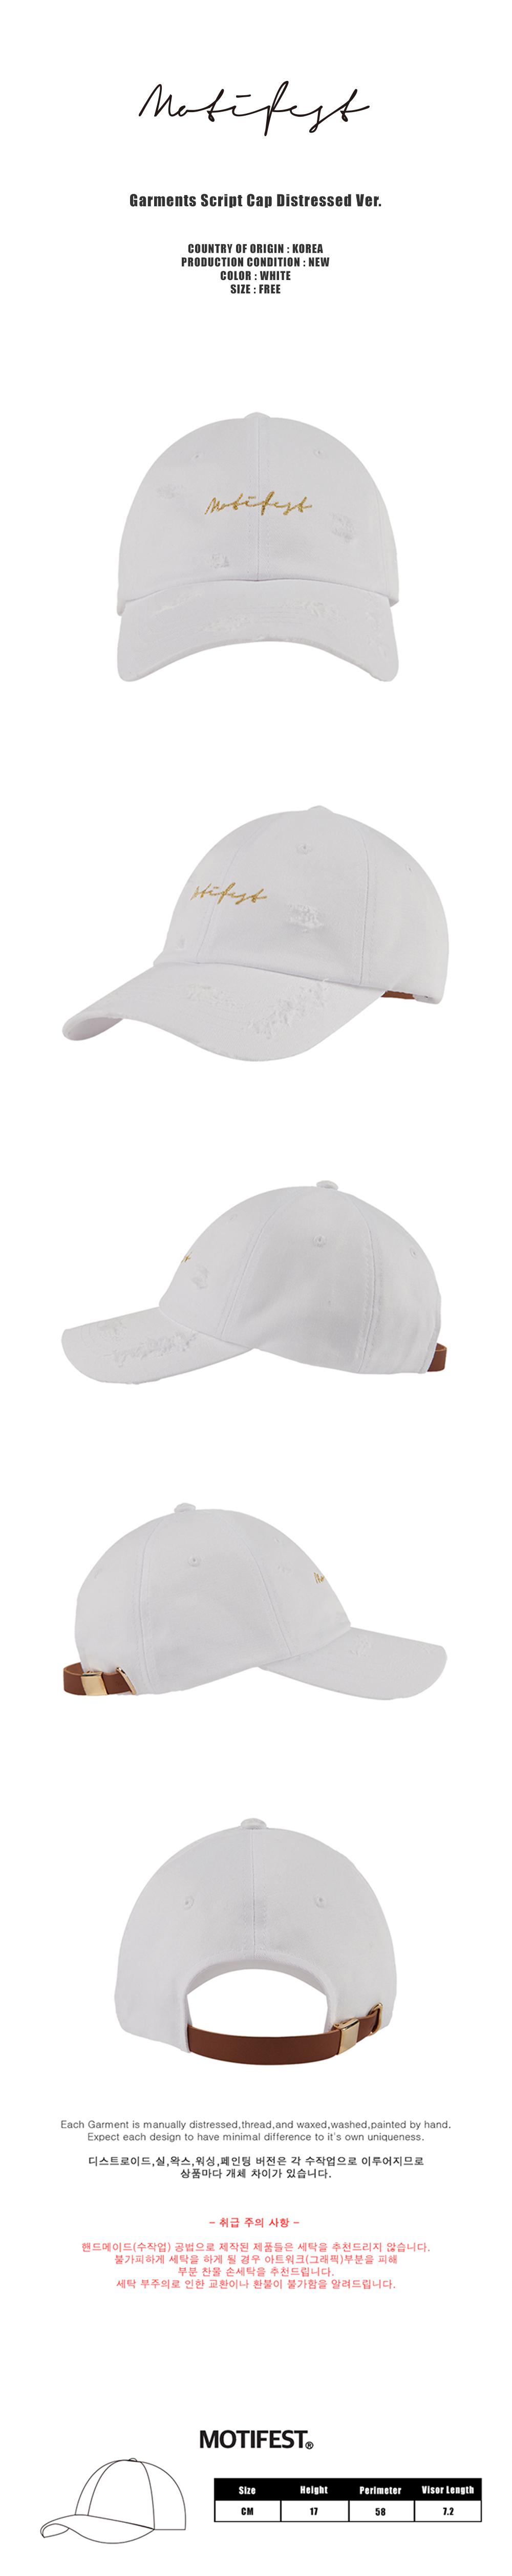 Garments Script Cap Distressed Ver-1000.jpg